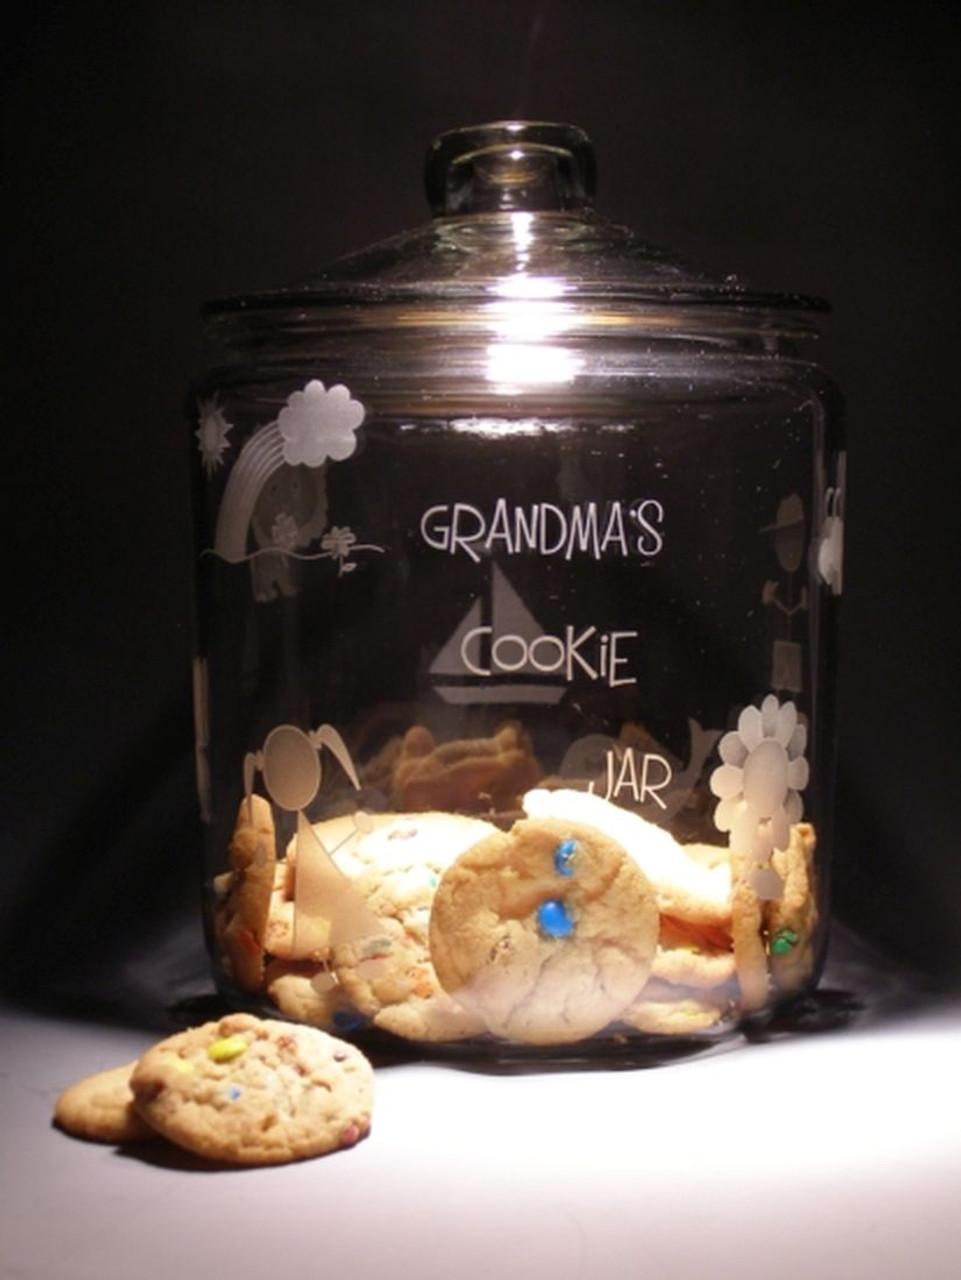 Hand Carved Crystal Cookie Jar - 1 Gal - Personalized